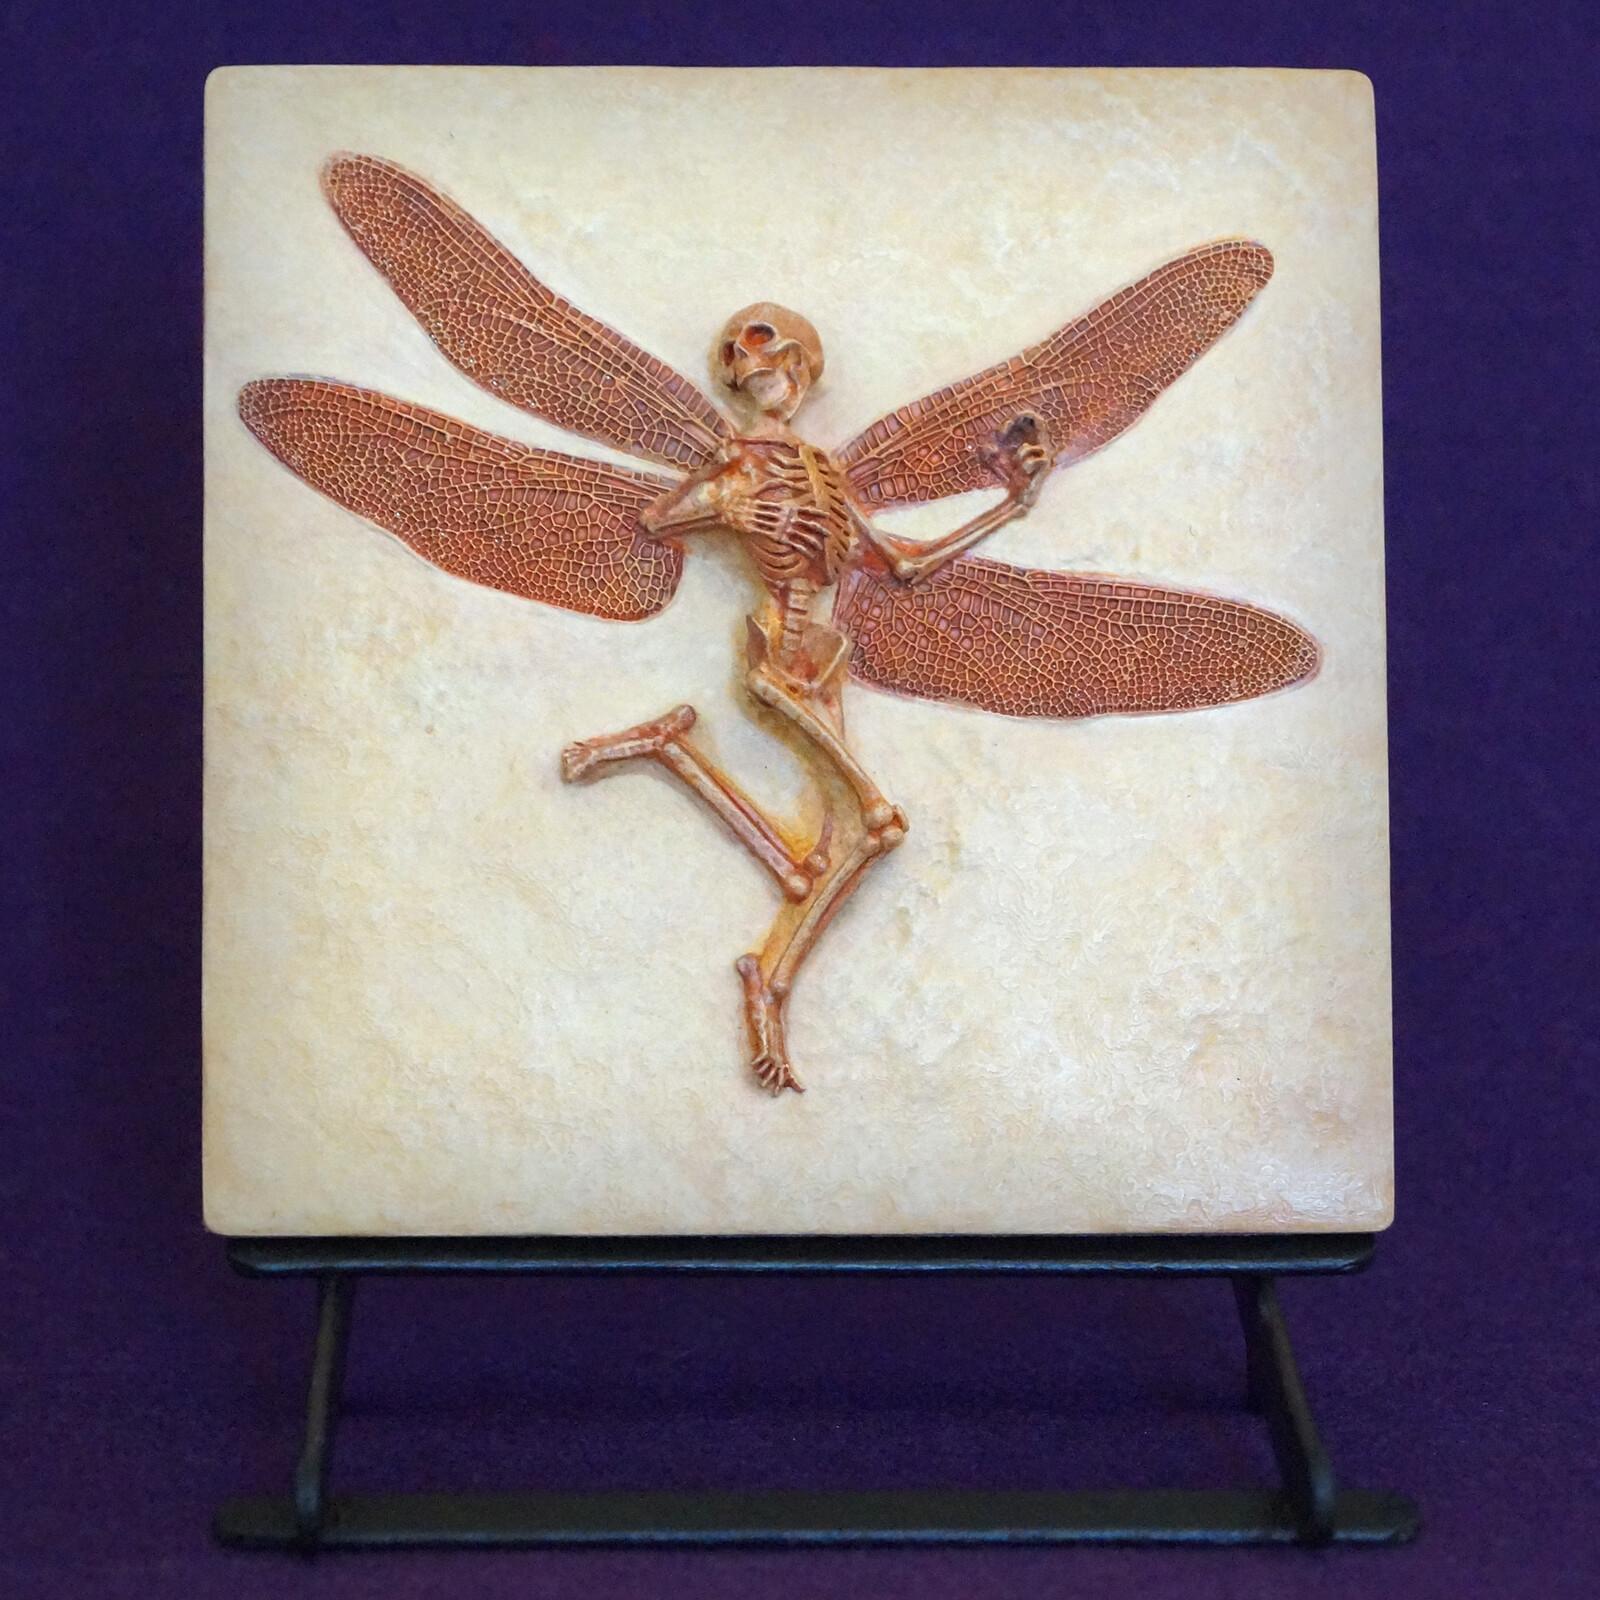 'Dancing' Fairy